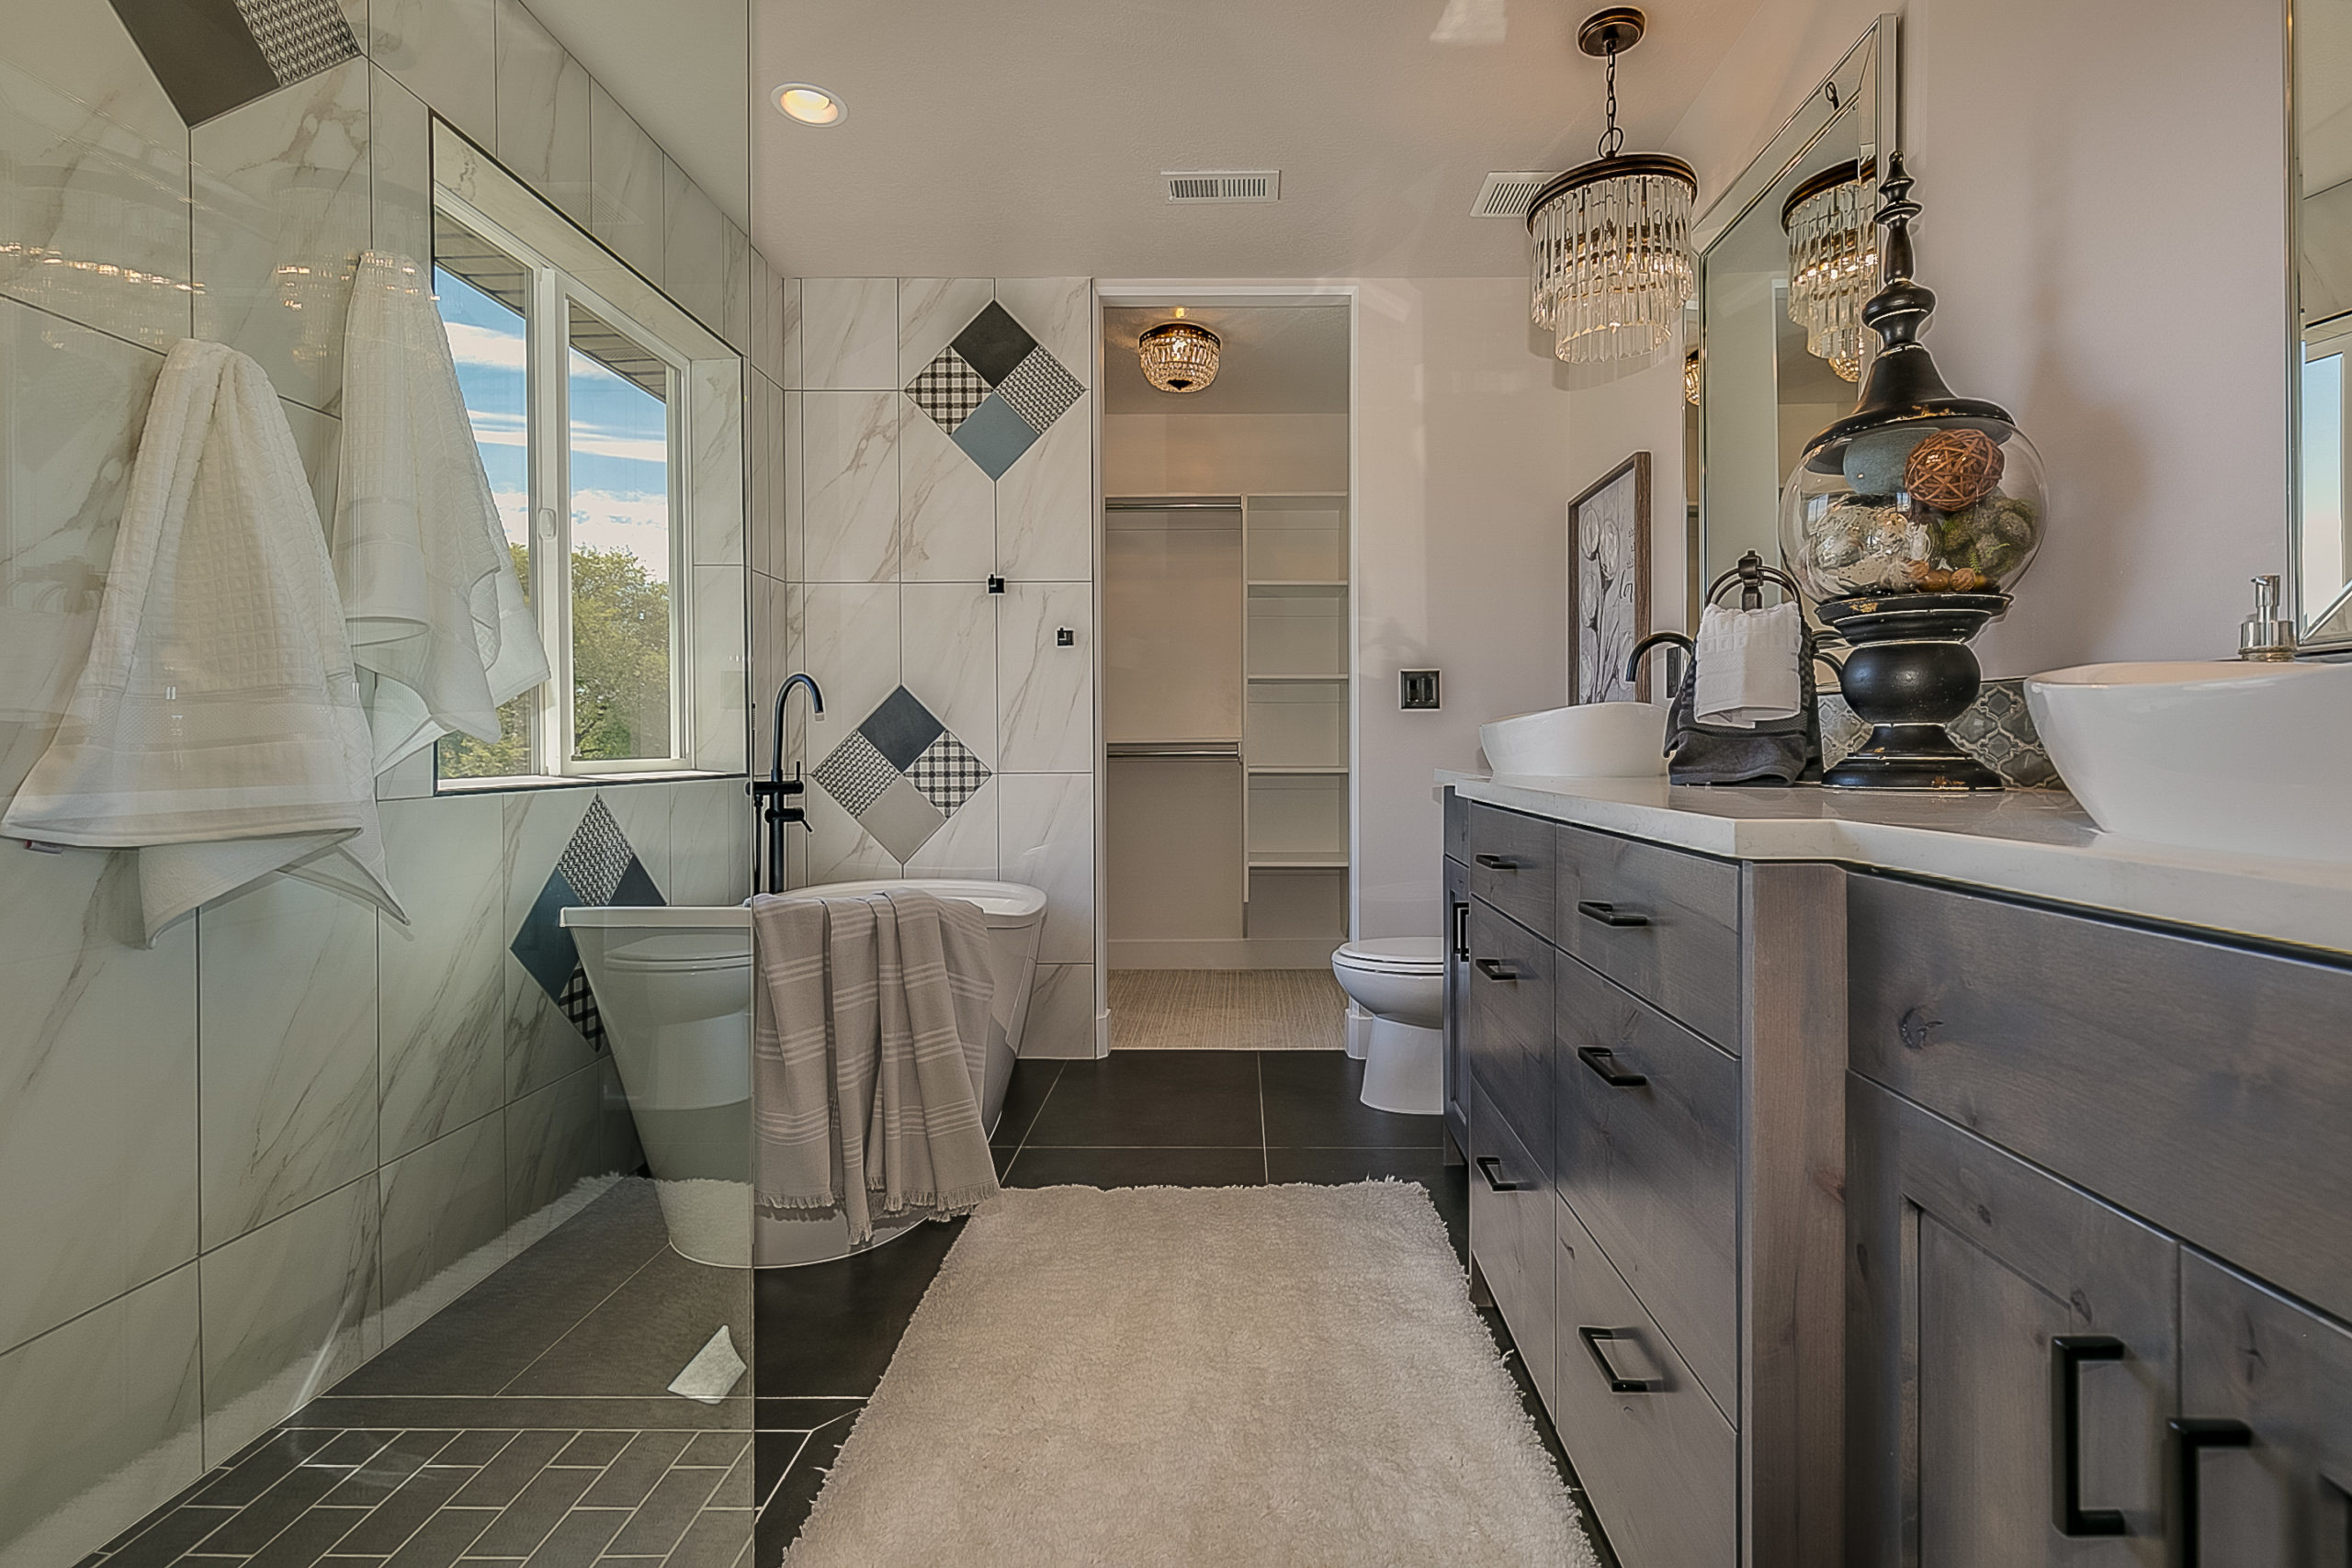 Double vessel sinks add trendy design to upscale bathroom